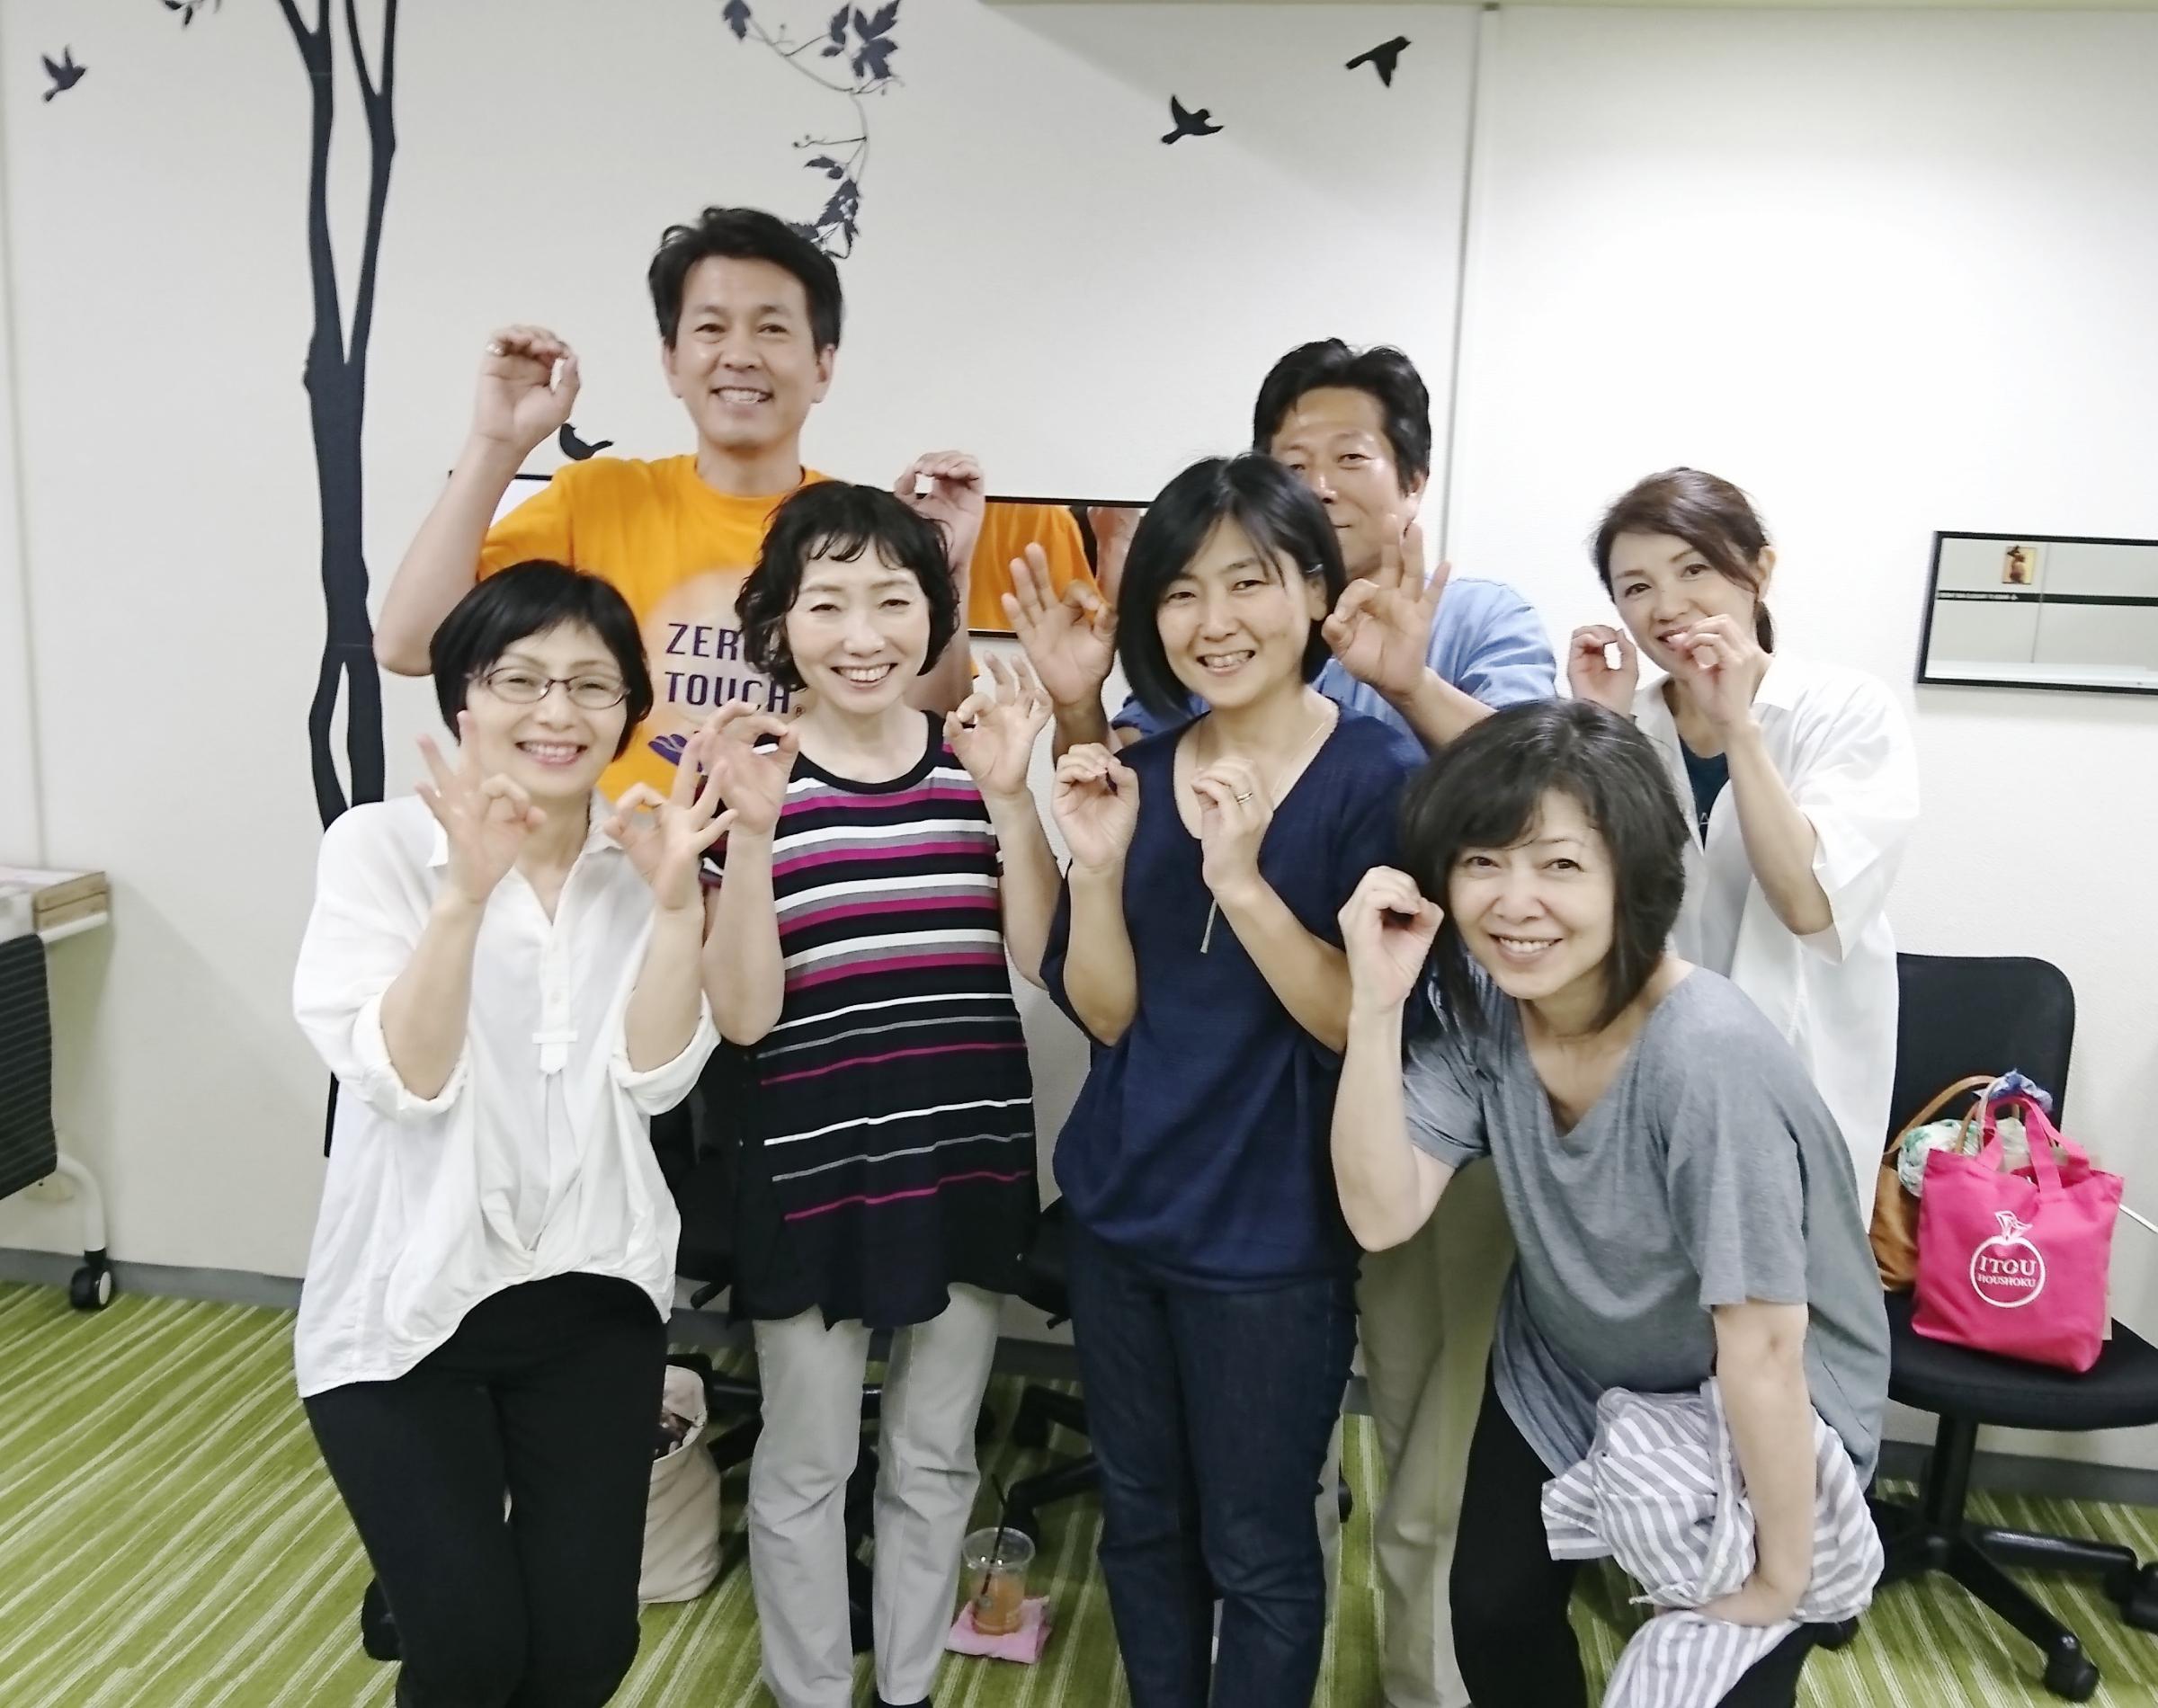 ZERO-G TOUCH®レベル1.2 ダイナミックトレーニングin広島🤗